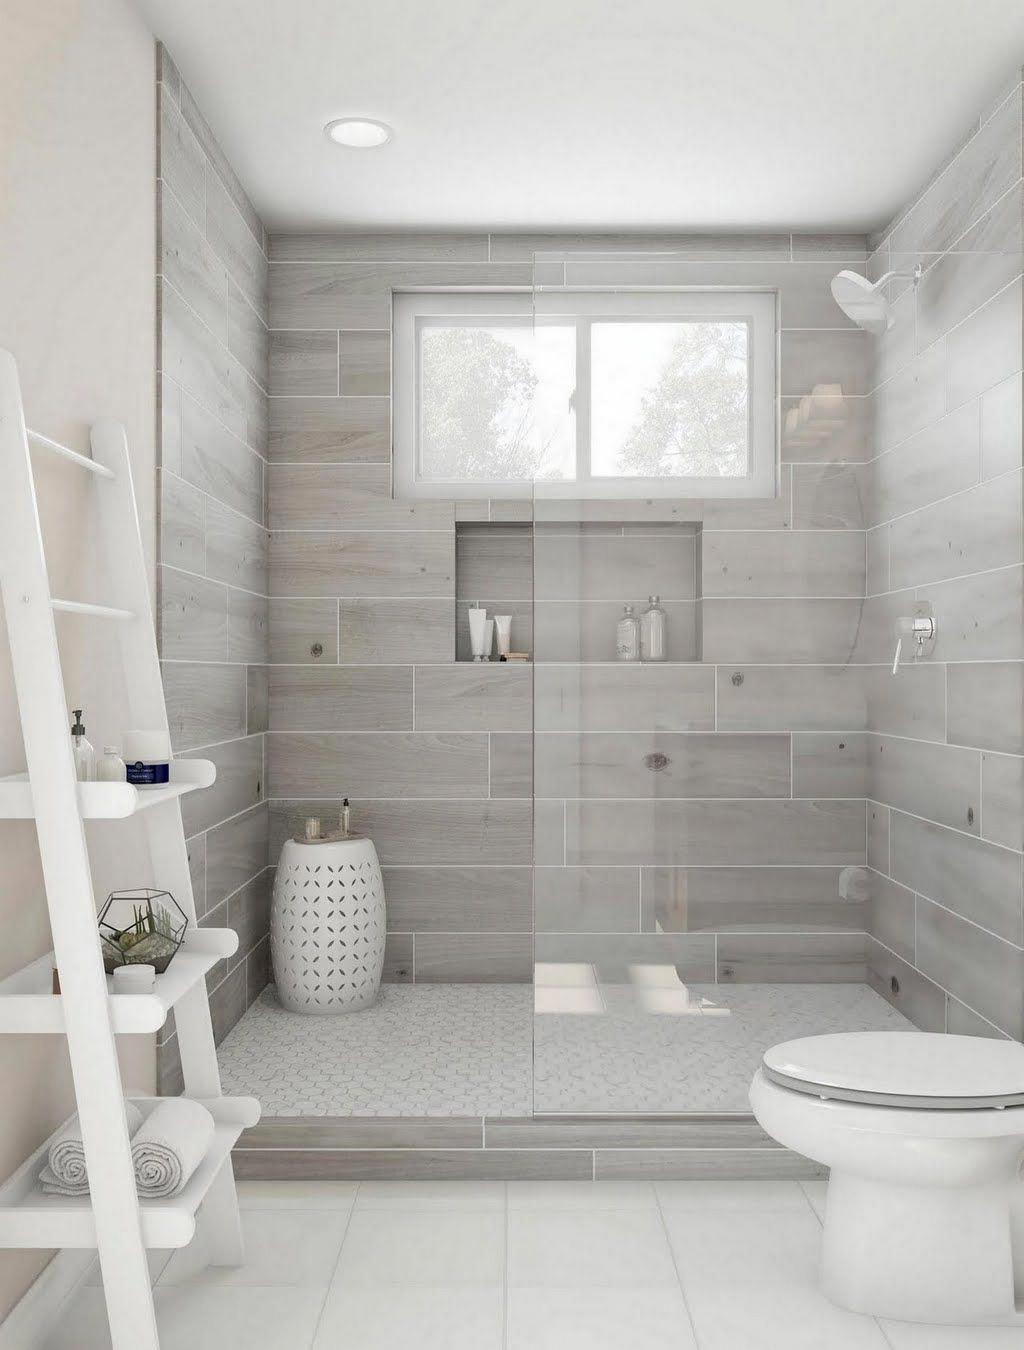 Msi Havenwood Platinum 8 In X 36 In Matte Porcelain Floor And Wall Tile 14 Sq Ft Case Nhavpla8x36 The Home Depot Unique Bathroom Tiles Bathroom Remodel Master Bathrooms Remodel